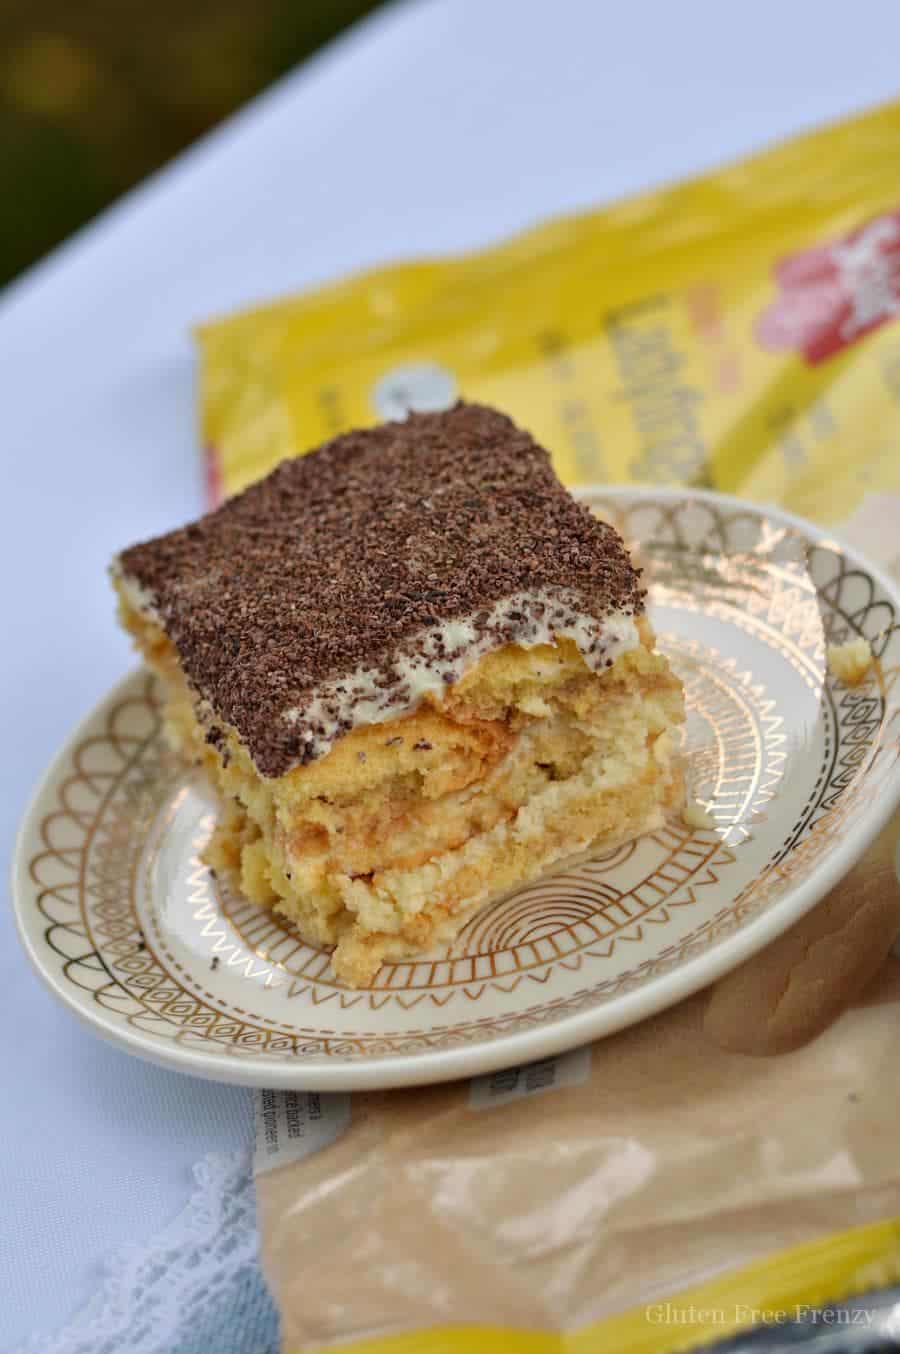 Rustic Italian Dinner Party And Gluten Free Tiramisu